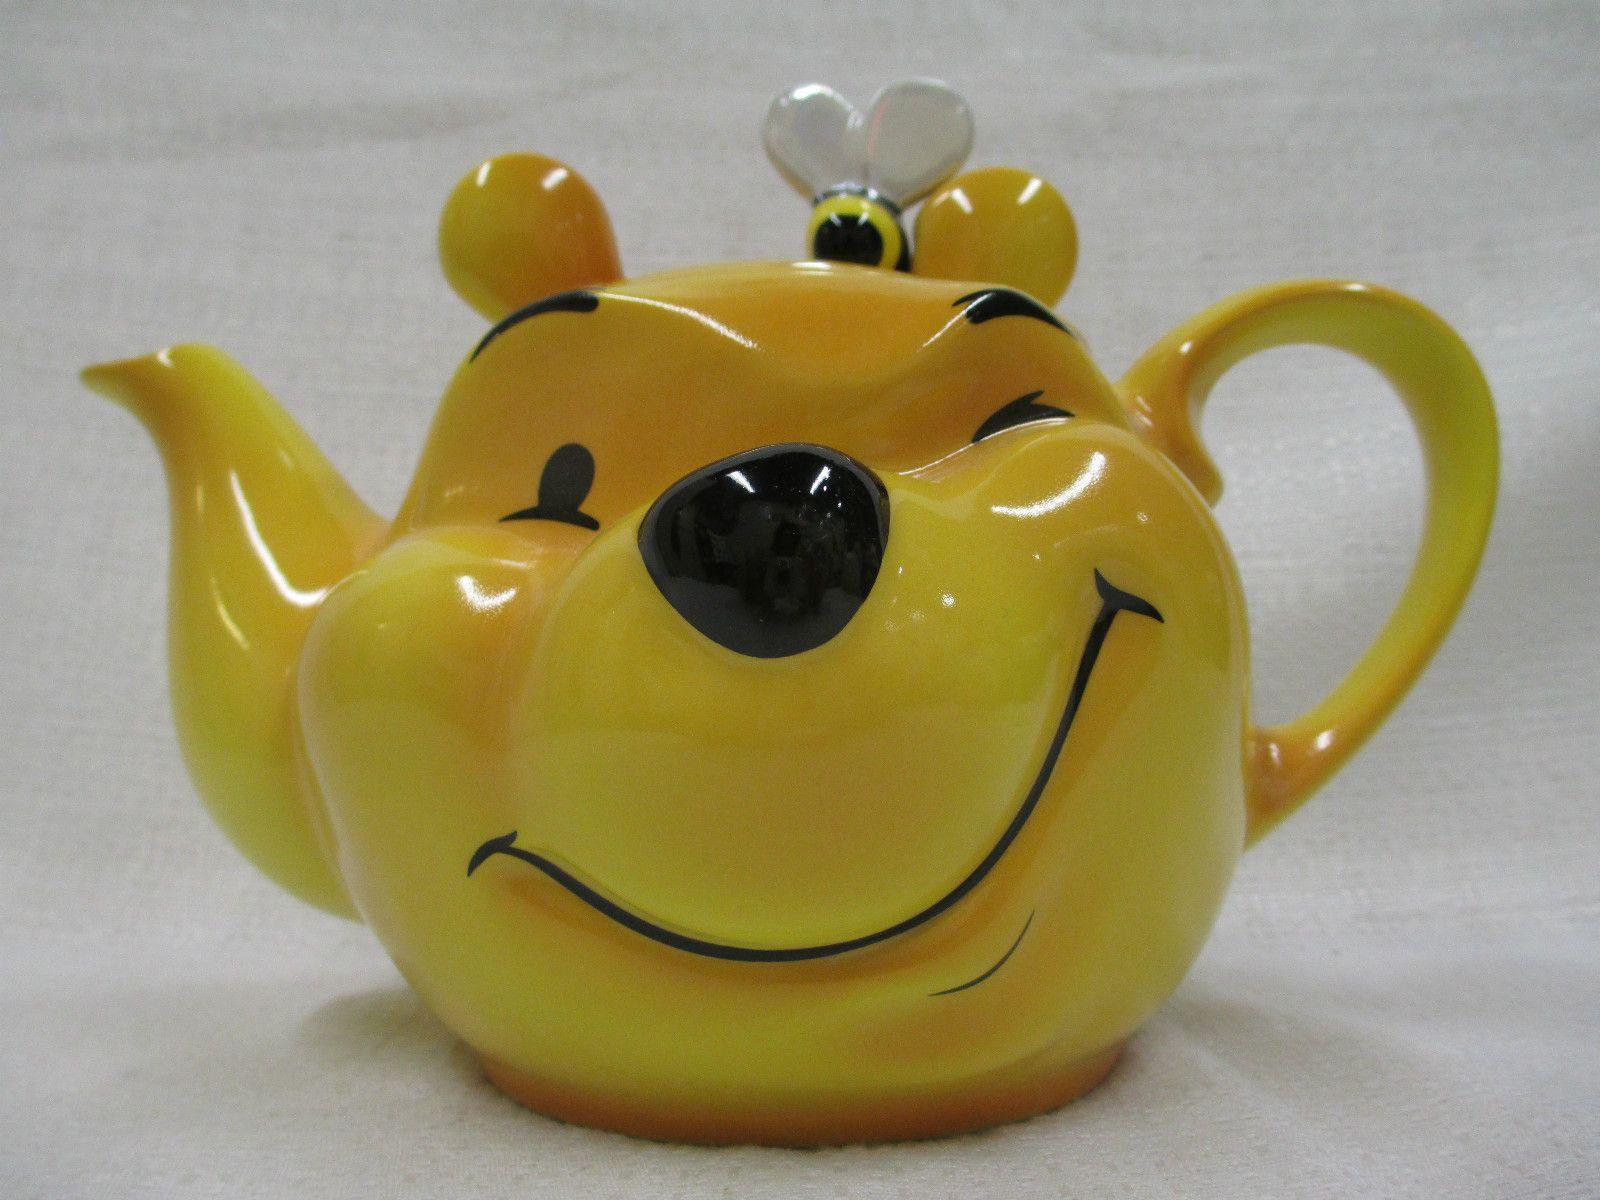 Winking Winnie The Pooh Teapot Tea Pots Cute Teapot Novelty Teapots